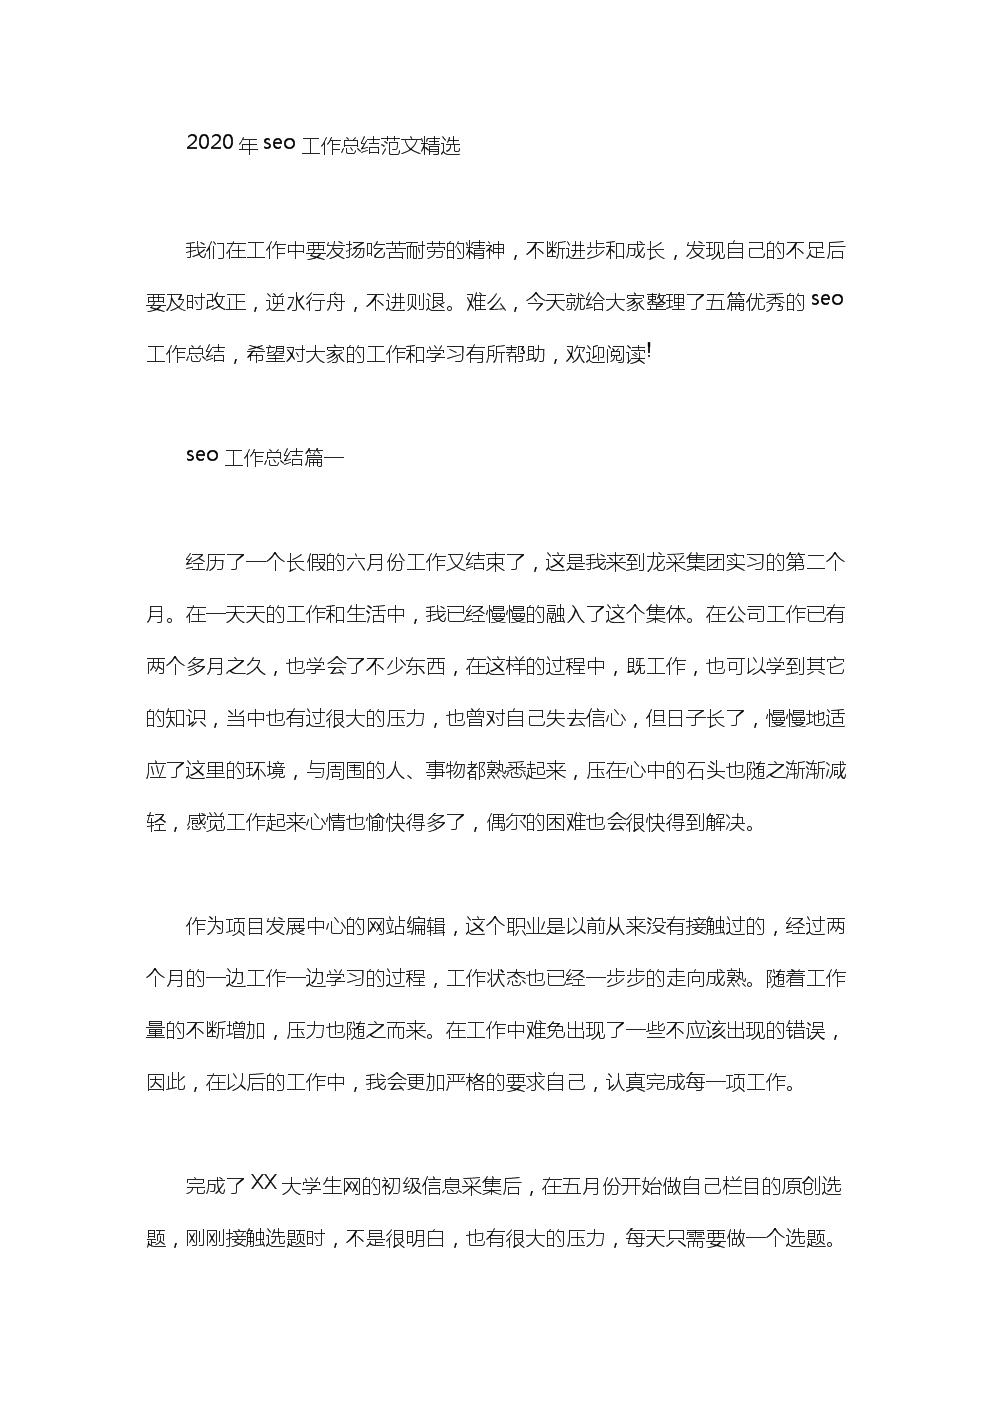 seo工作总结例文.doc